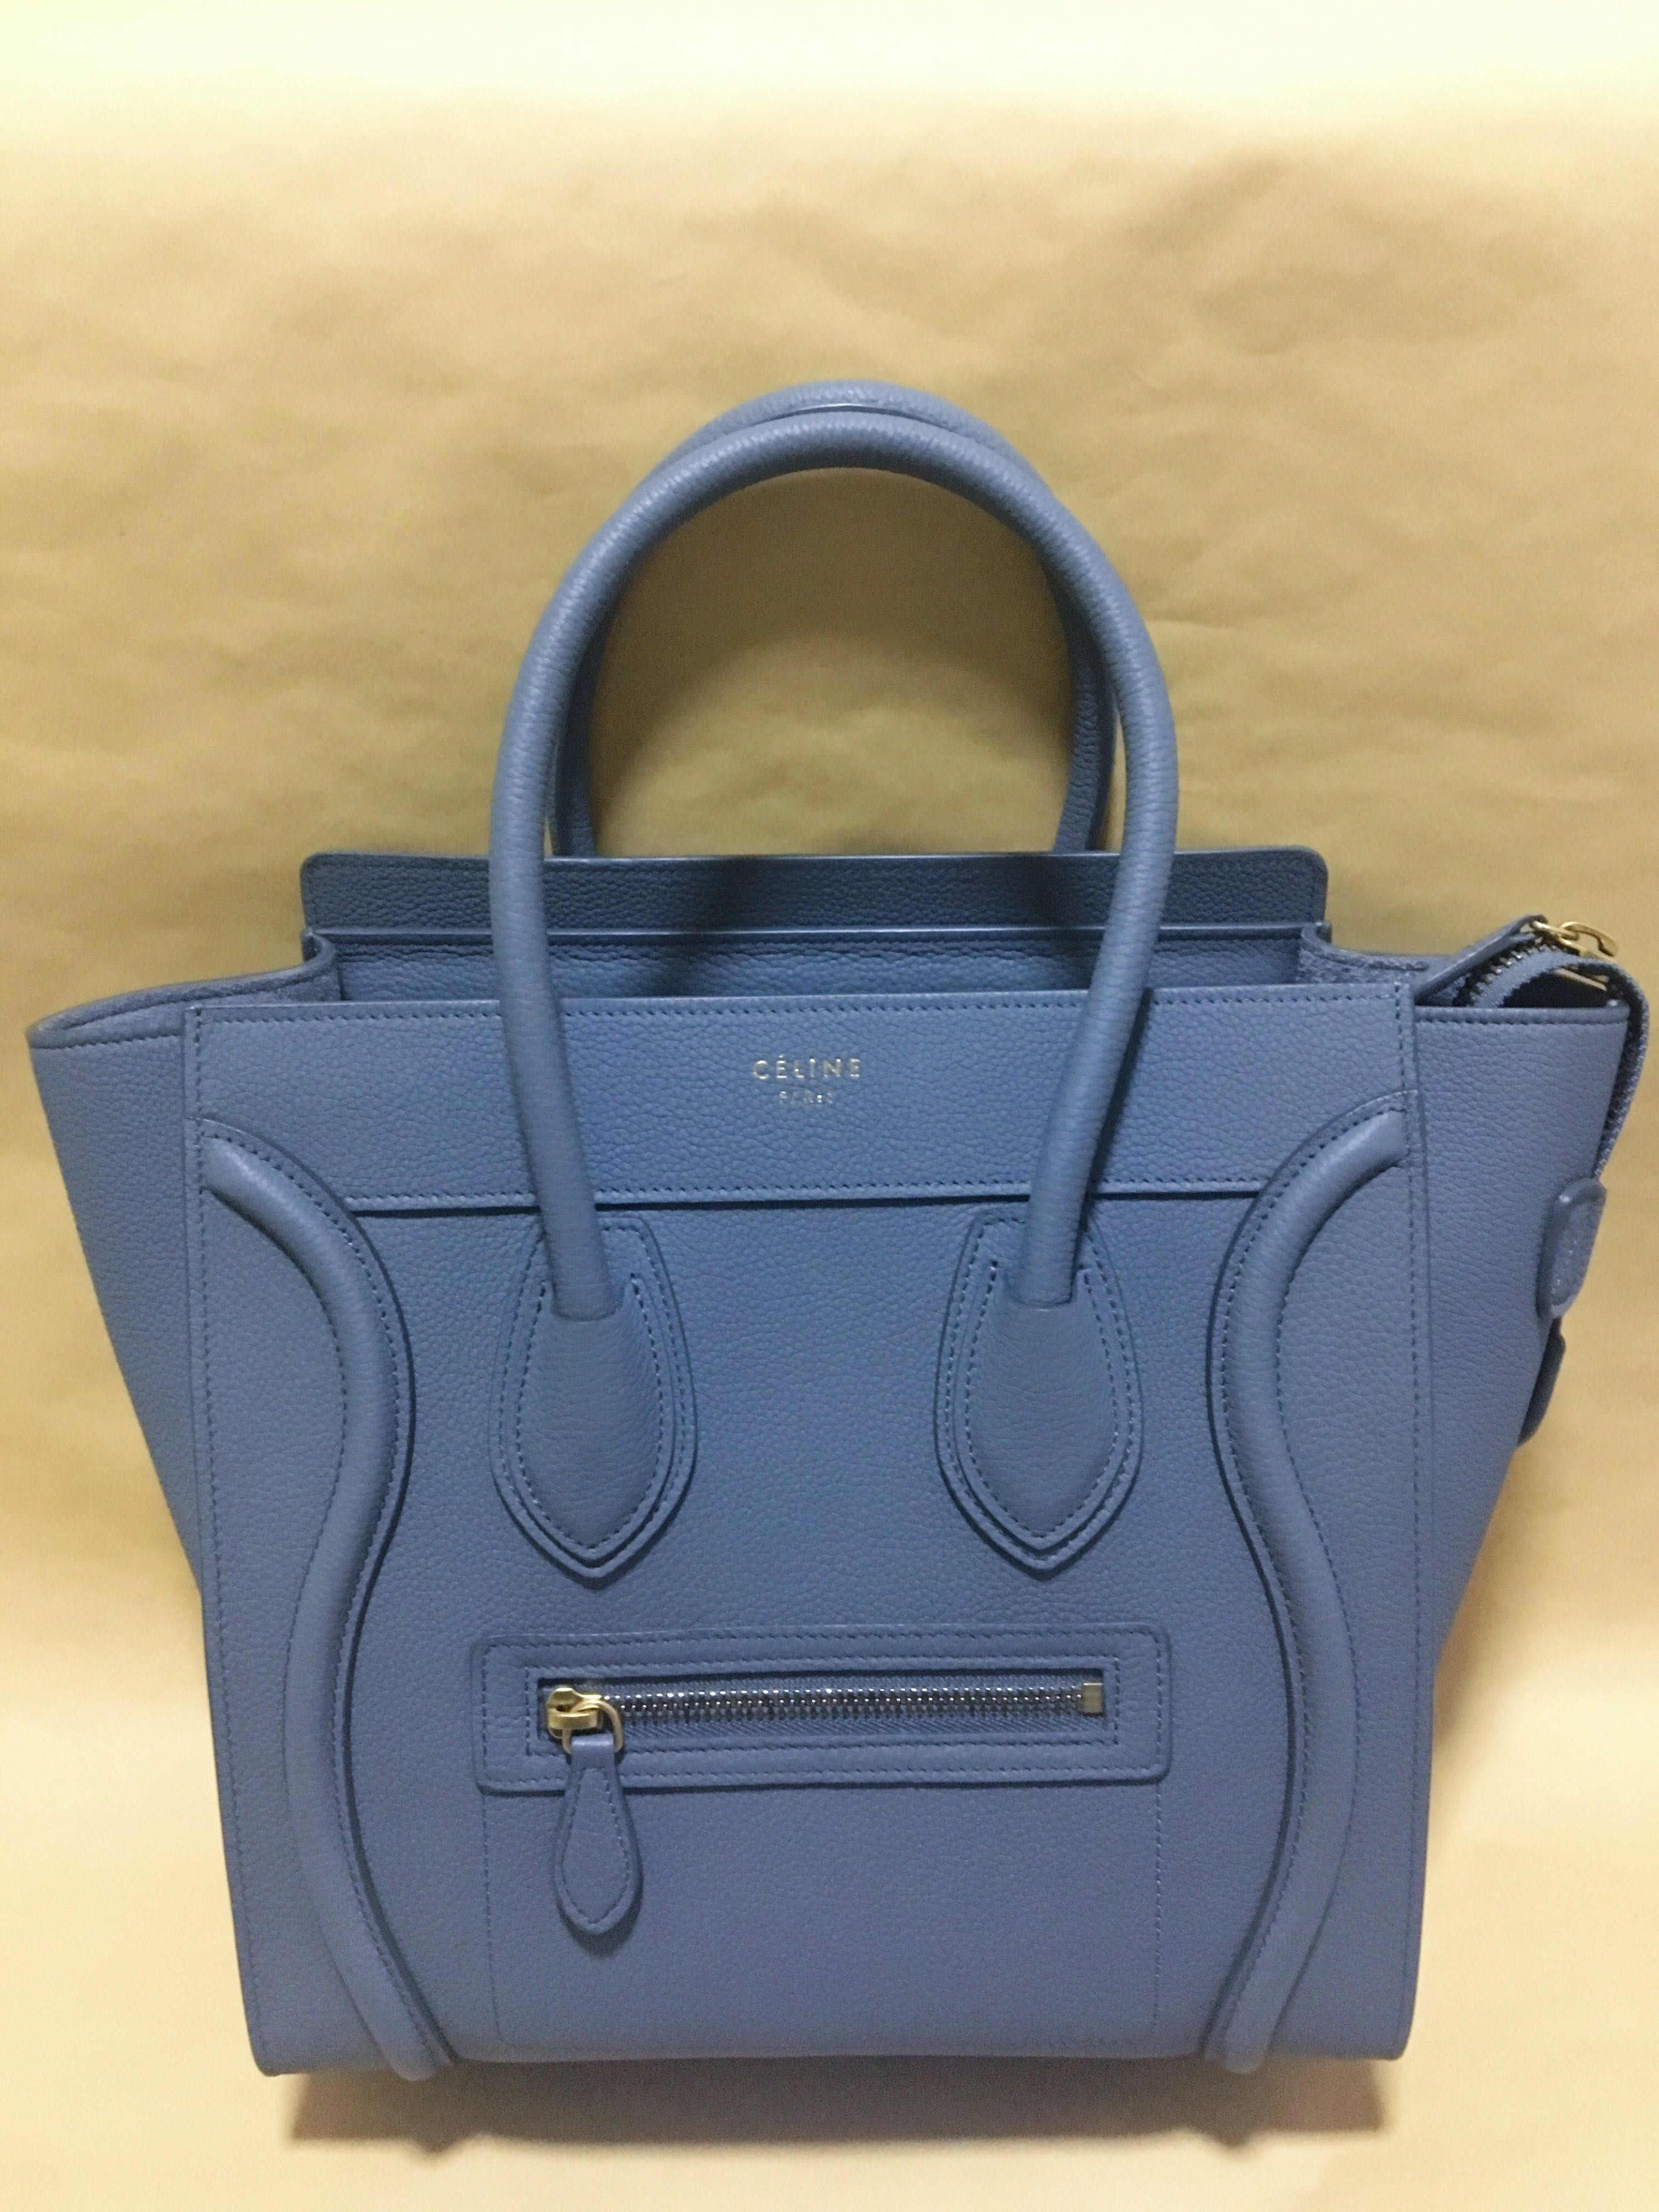 Celine Micro Luggage in Kohl c032b7e2b7acc